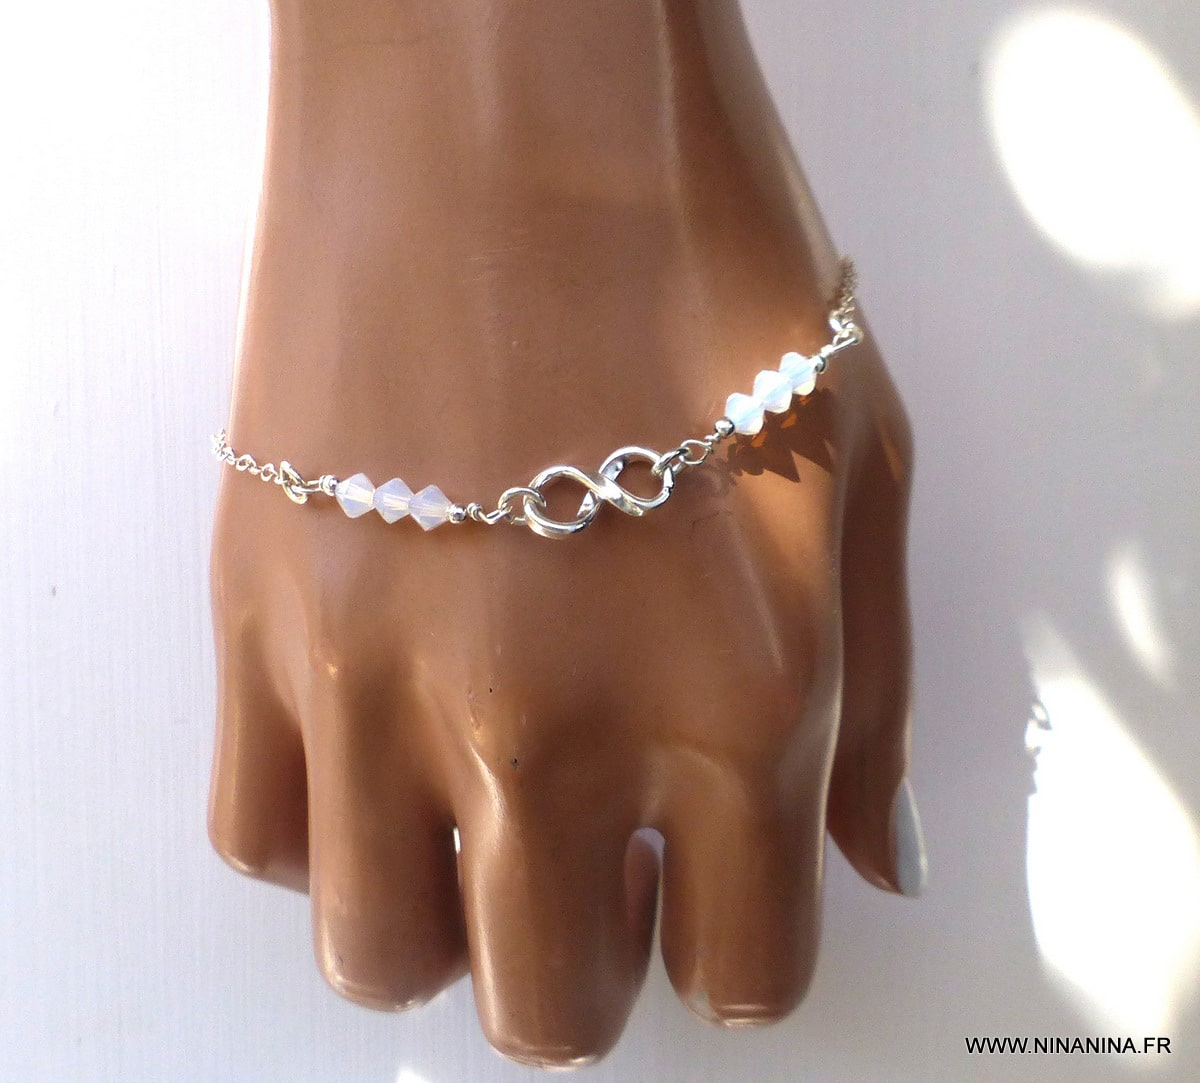 Bracelet infini Swarovski argent 925 massif perles blanches